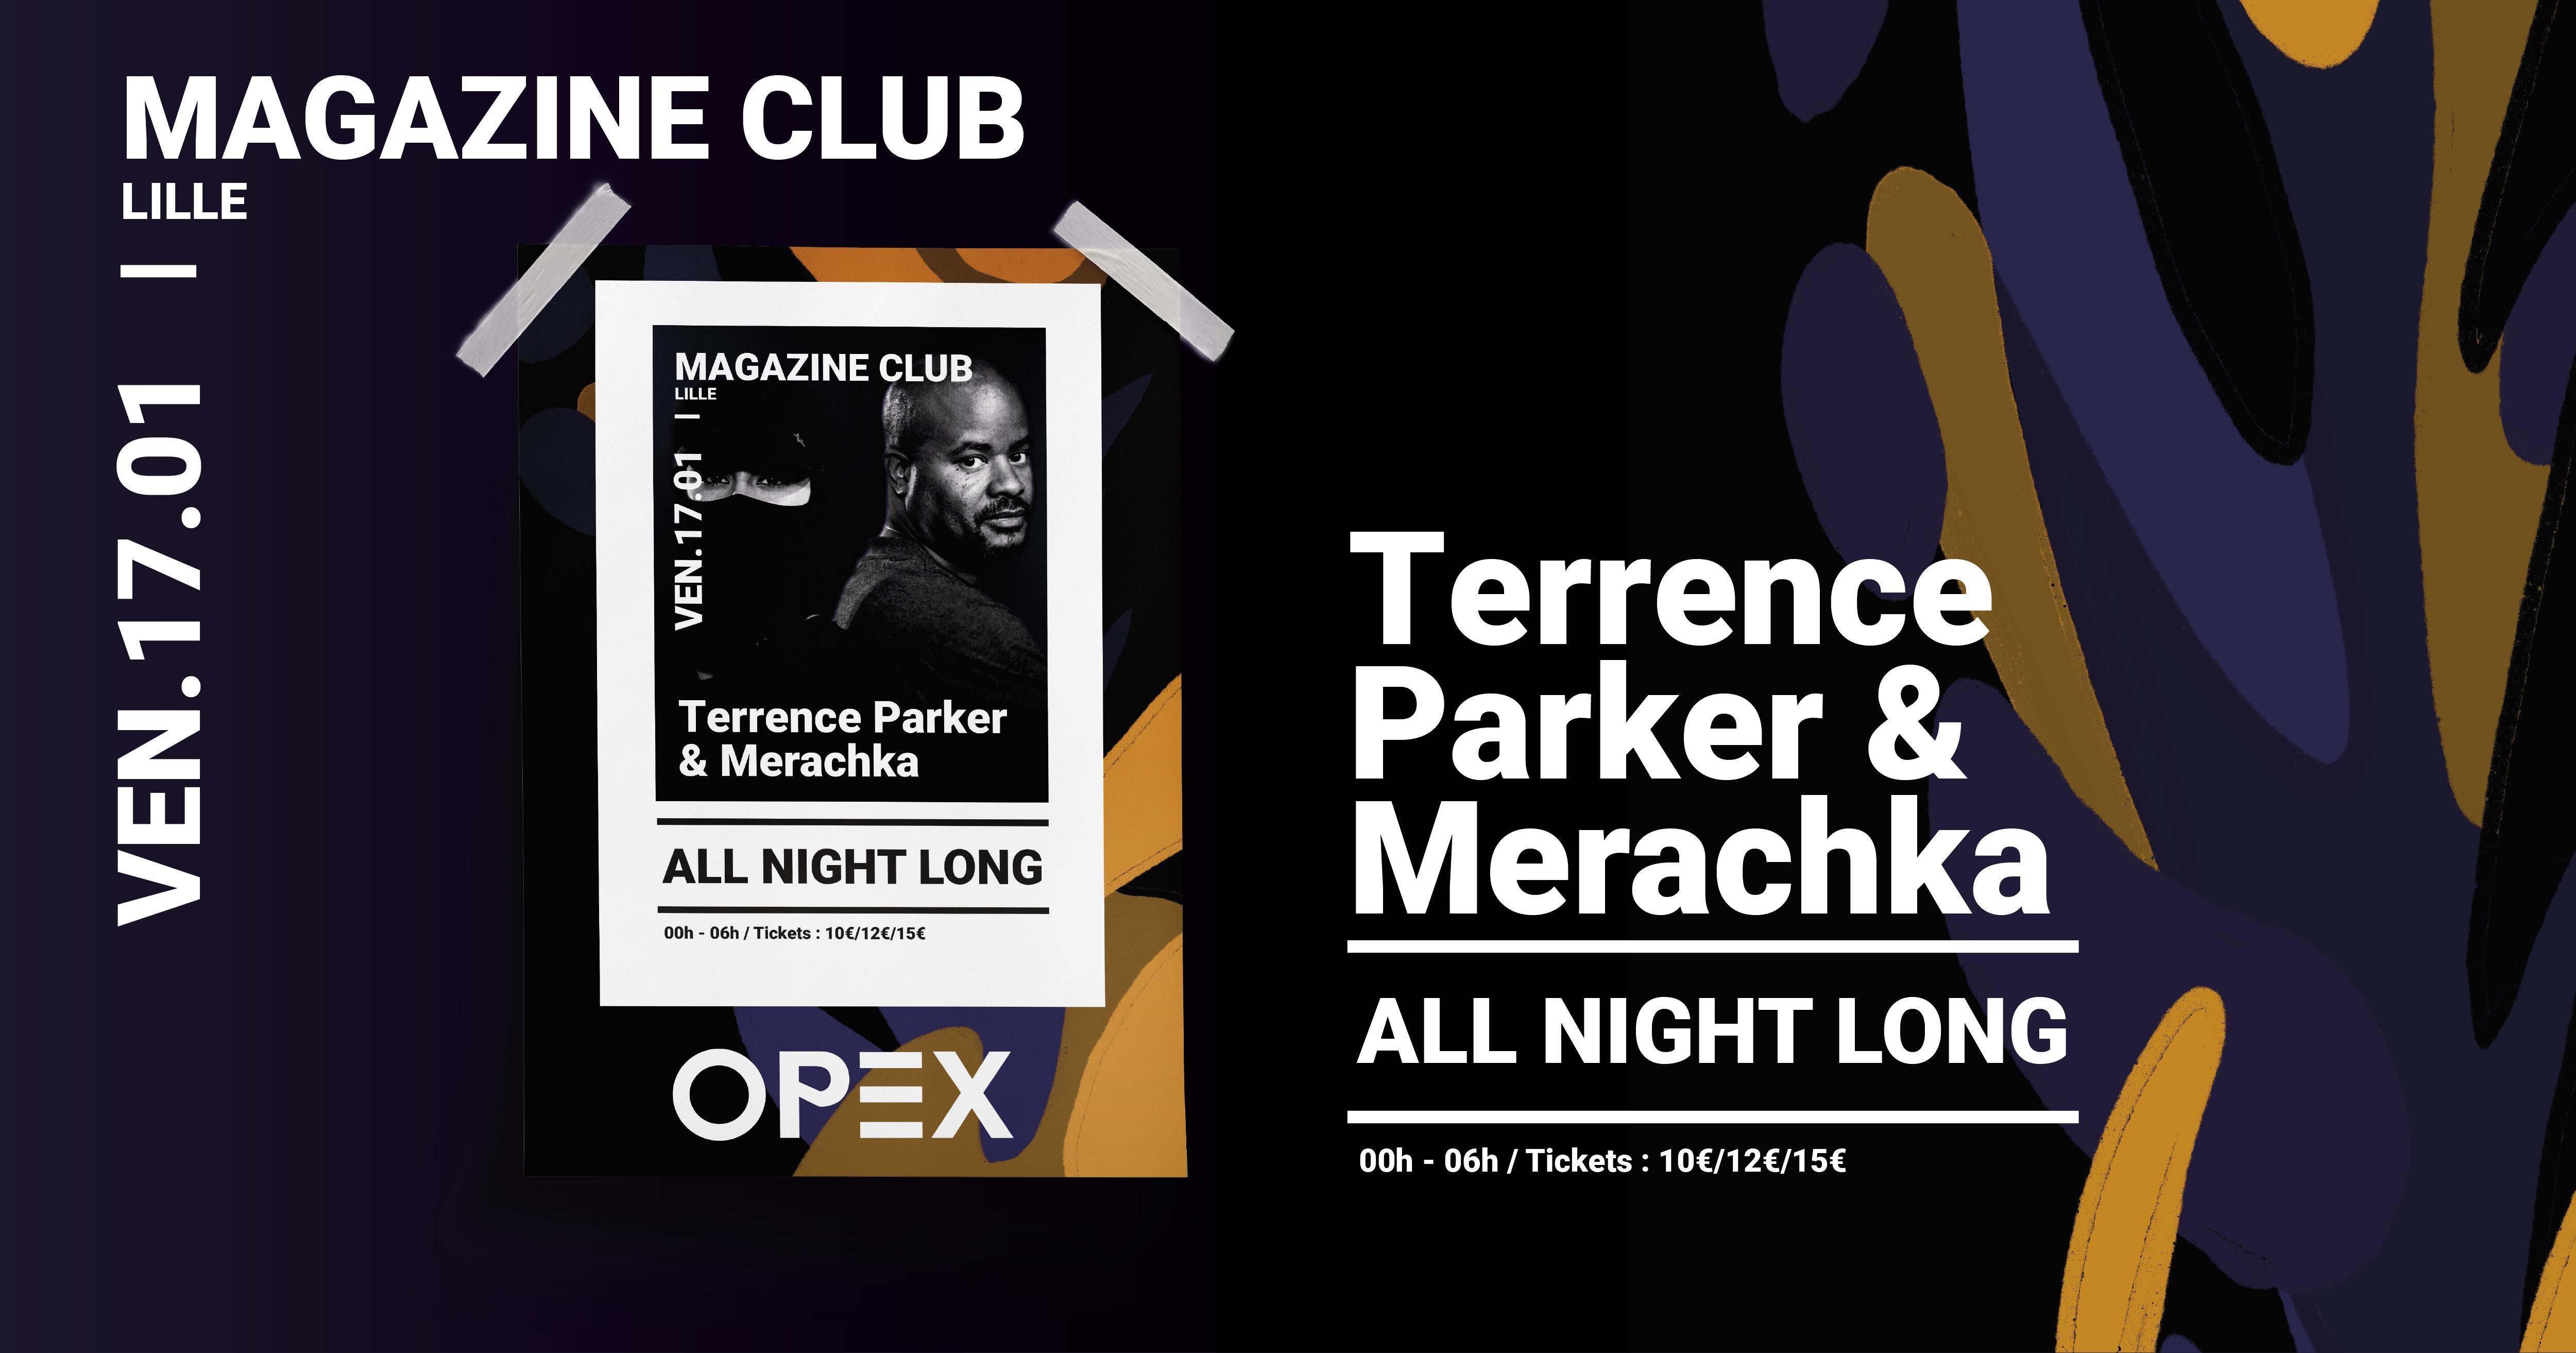 OPEX présente Terrence Parker & Merachka (all night long)